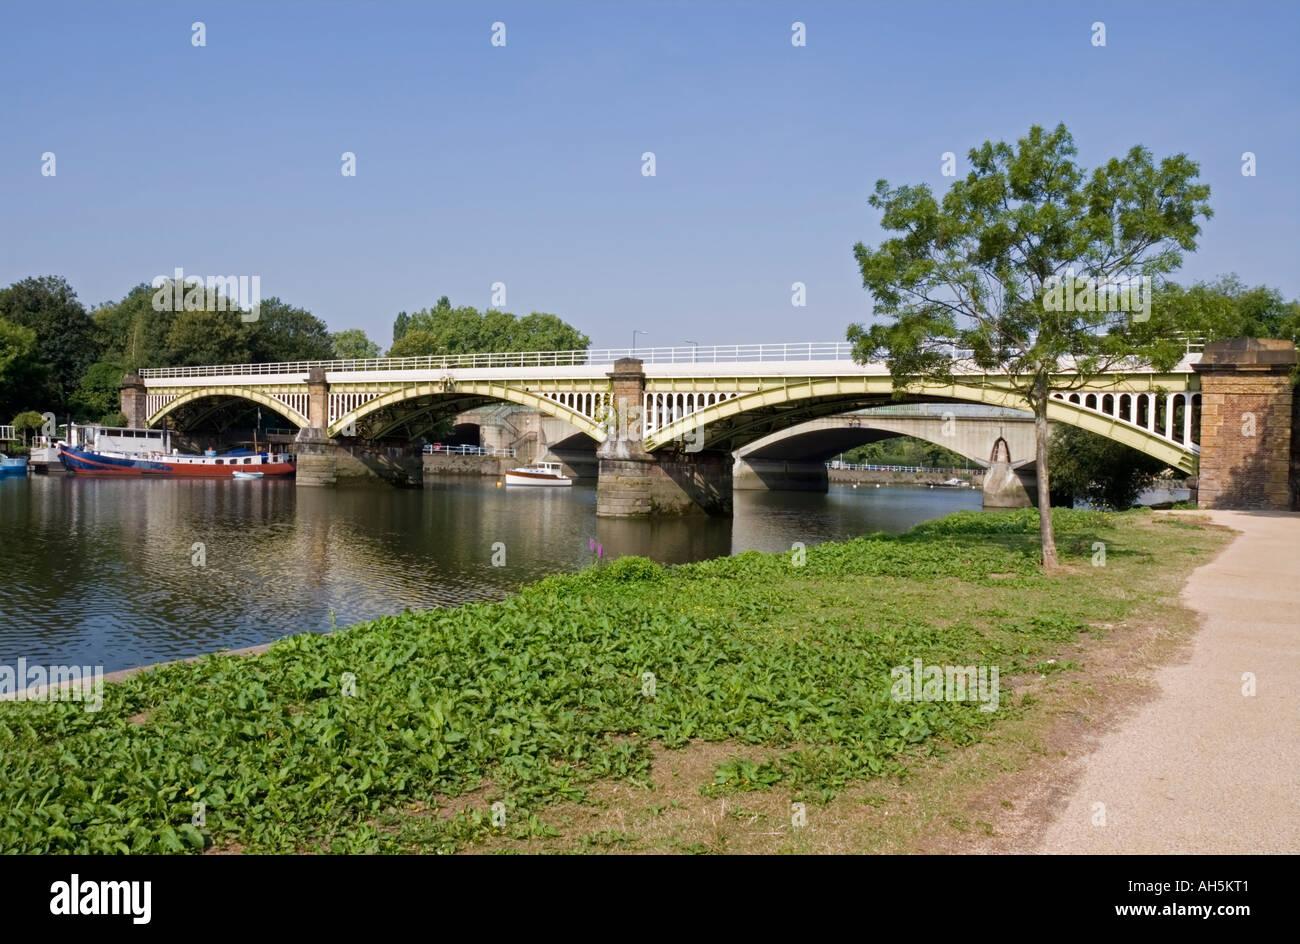 Richmond railway bridge on the River Thames, London - Stock Image